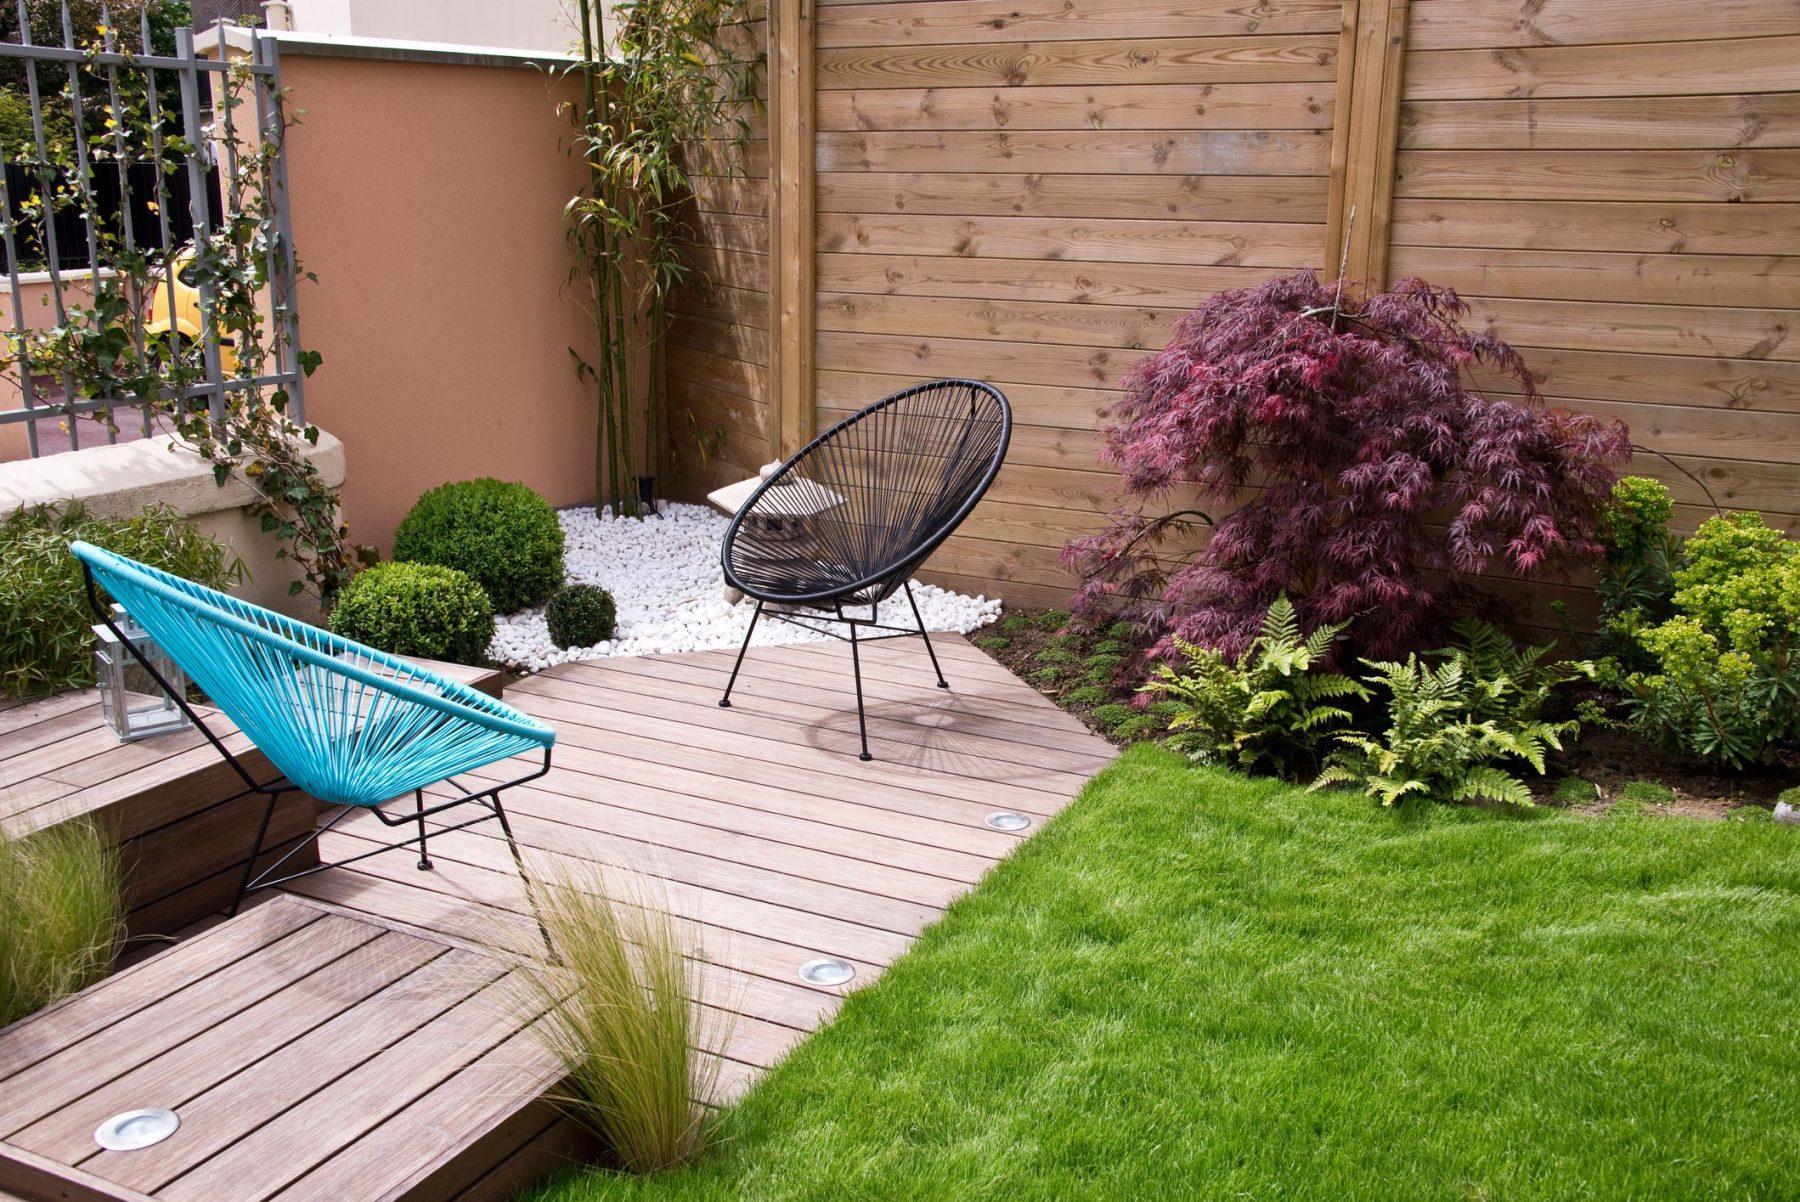 garden design ideas on a budget